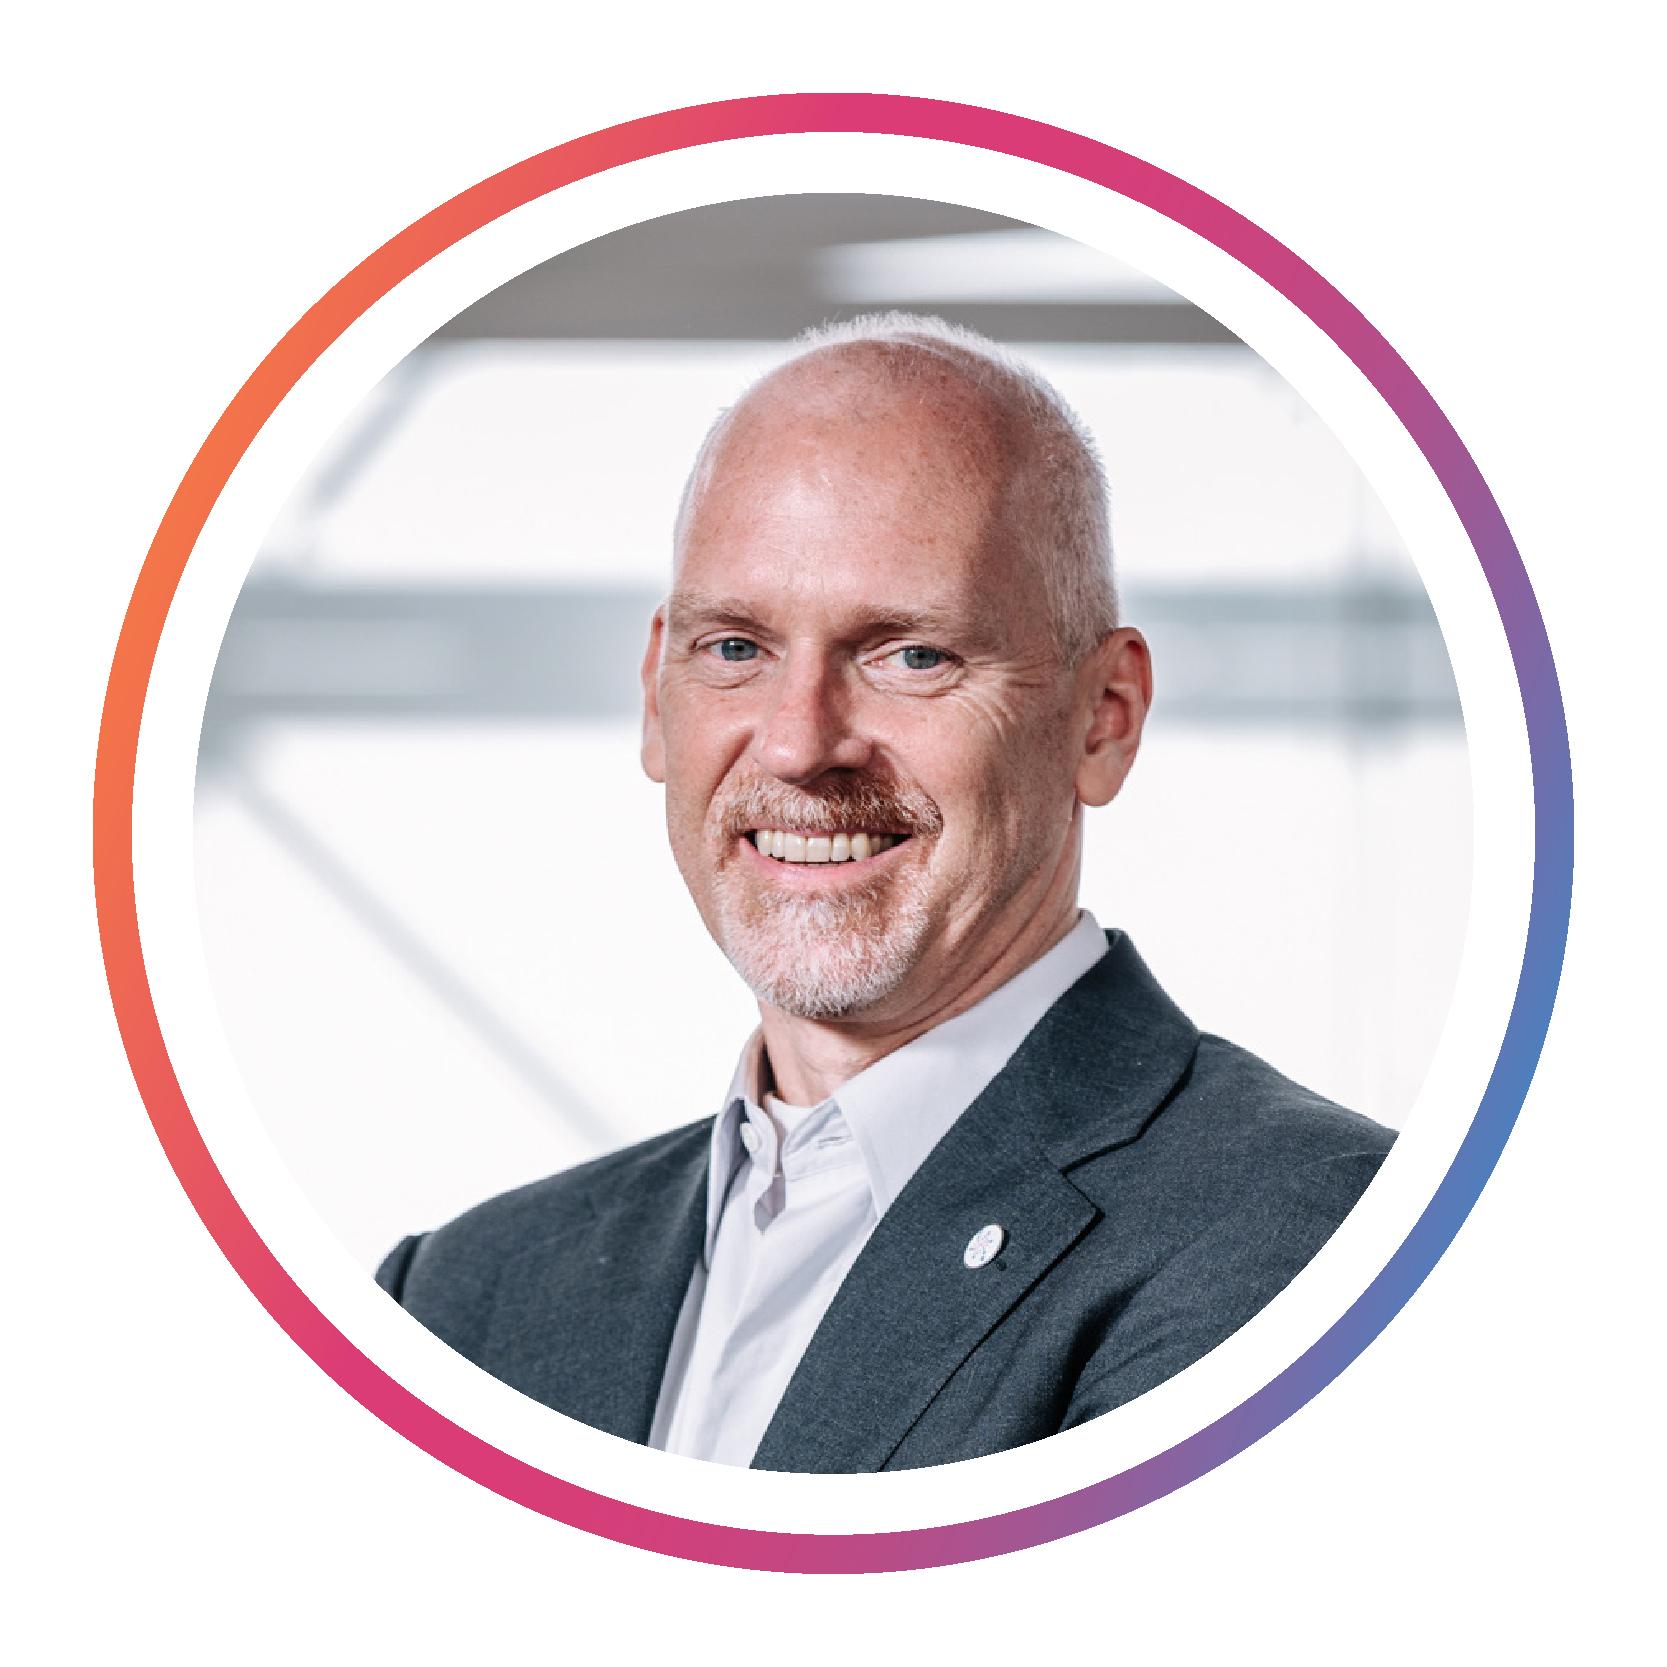 Greg Sherwin | Innovation and Digital Technologies